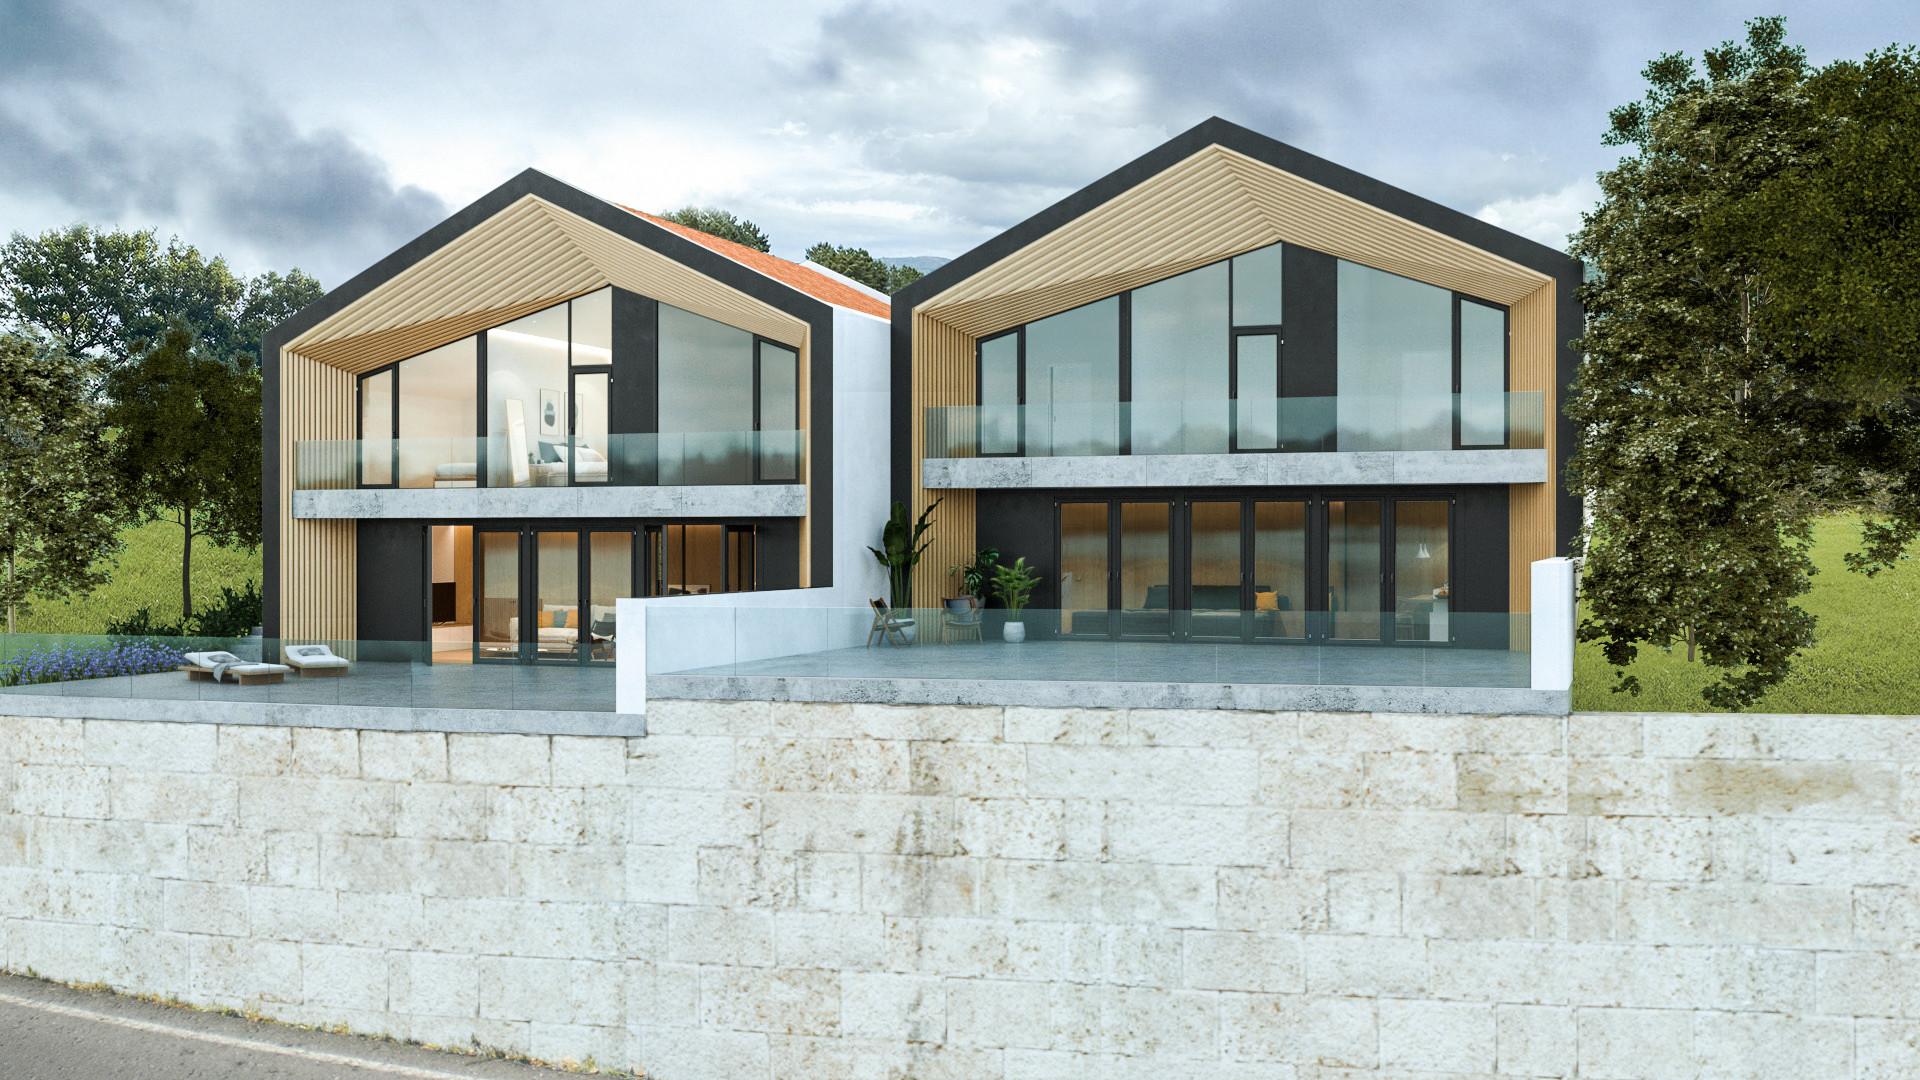 arquitectura-senmais-20.17.04.jpg